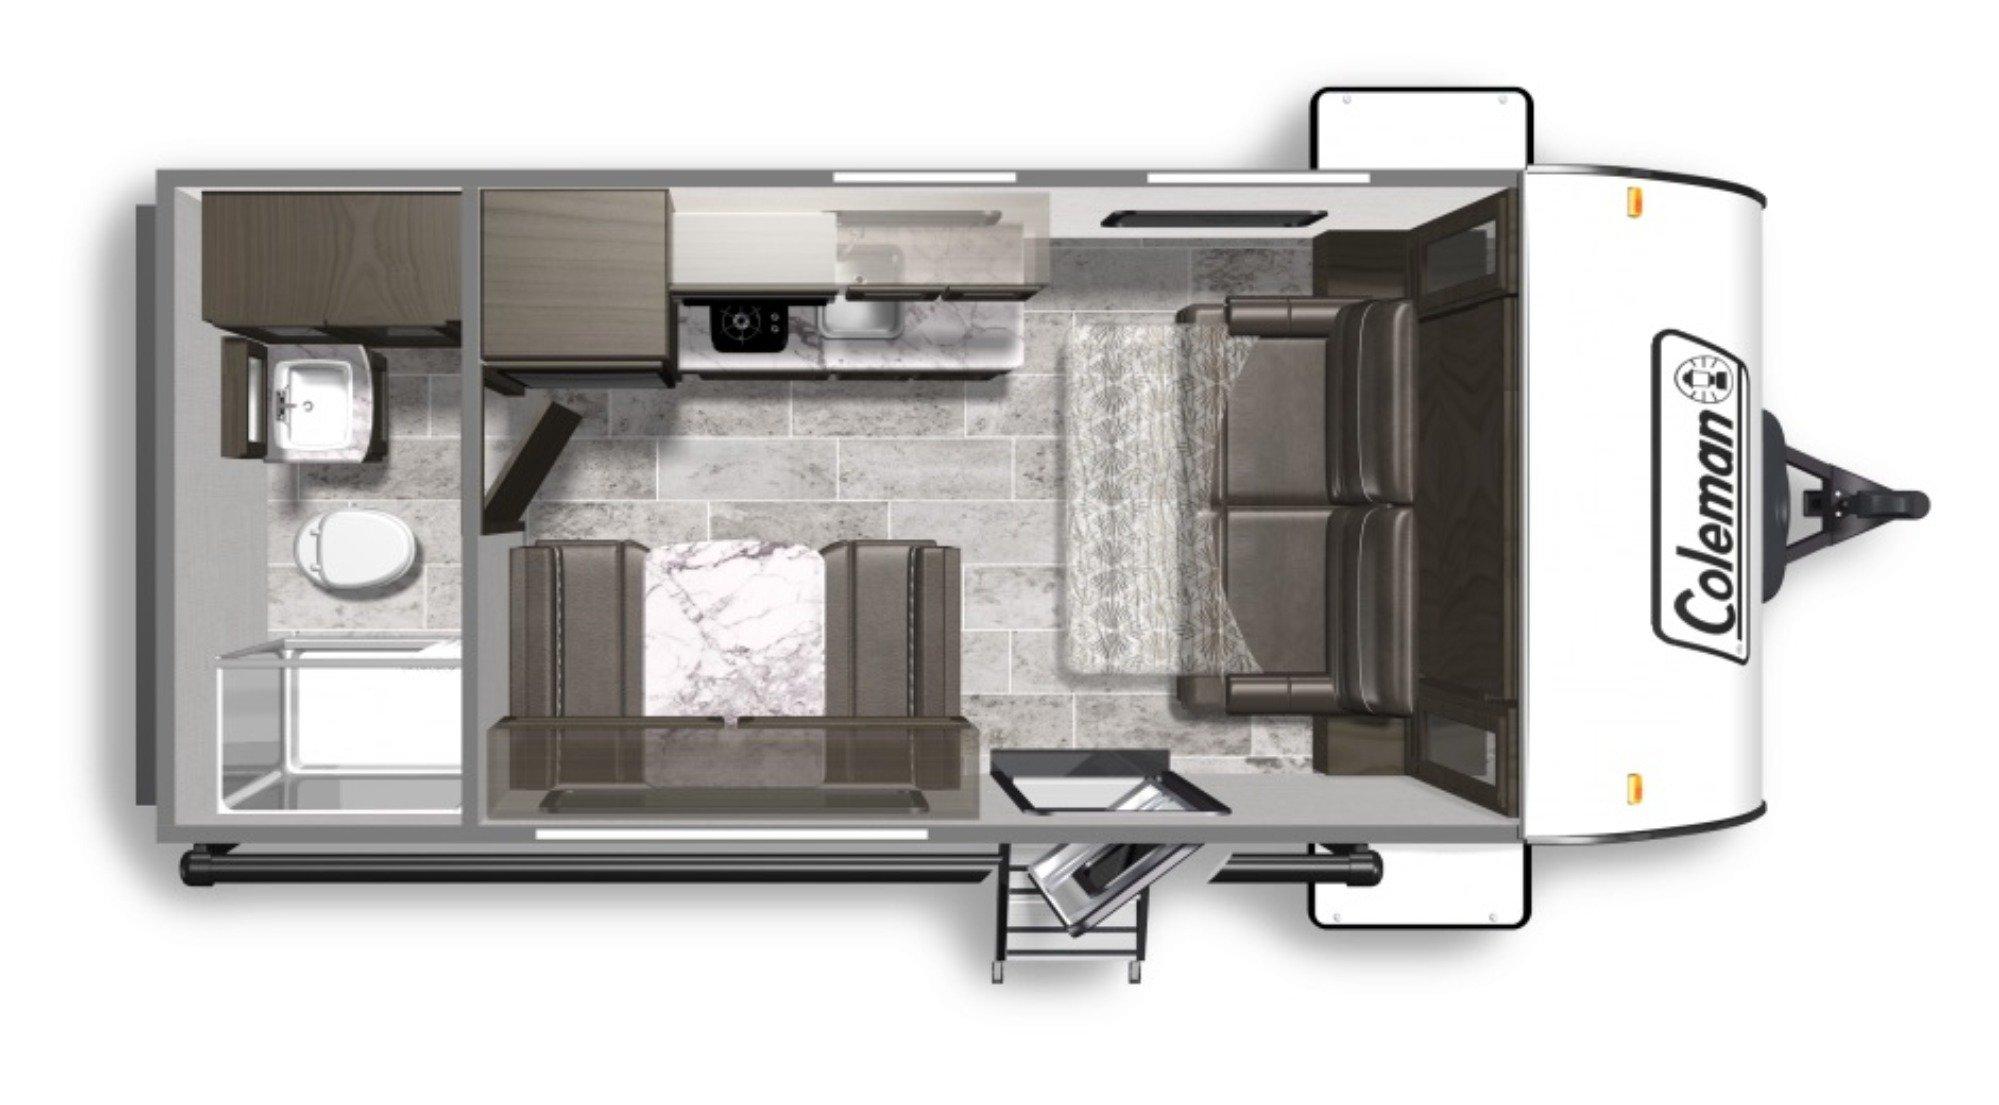 View Floor Plan for 2020 COLEMAN COLEMAN LIGHT LX 1705RB